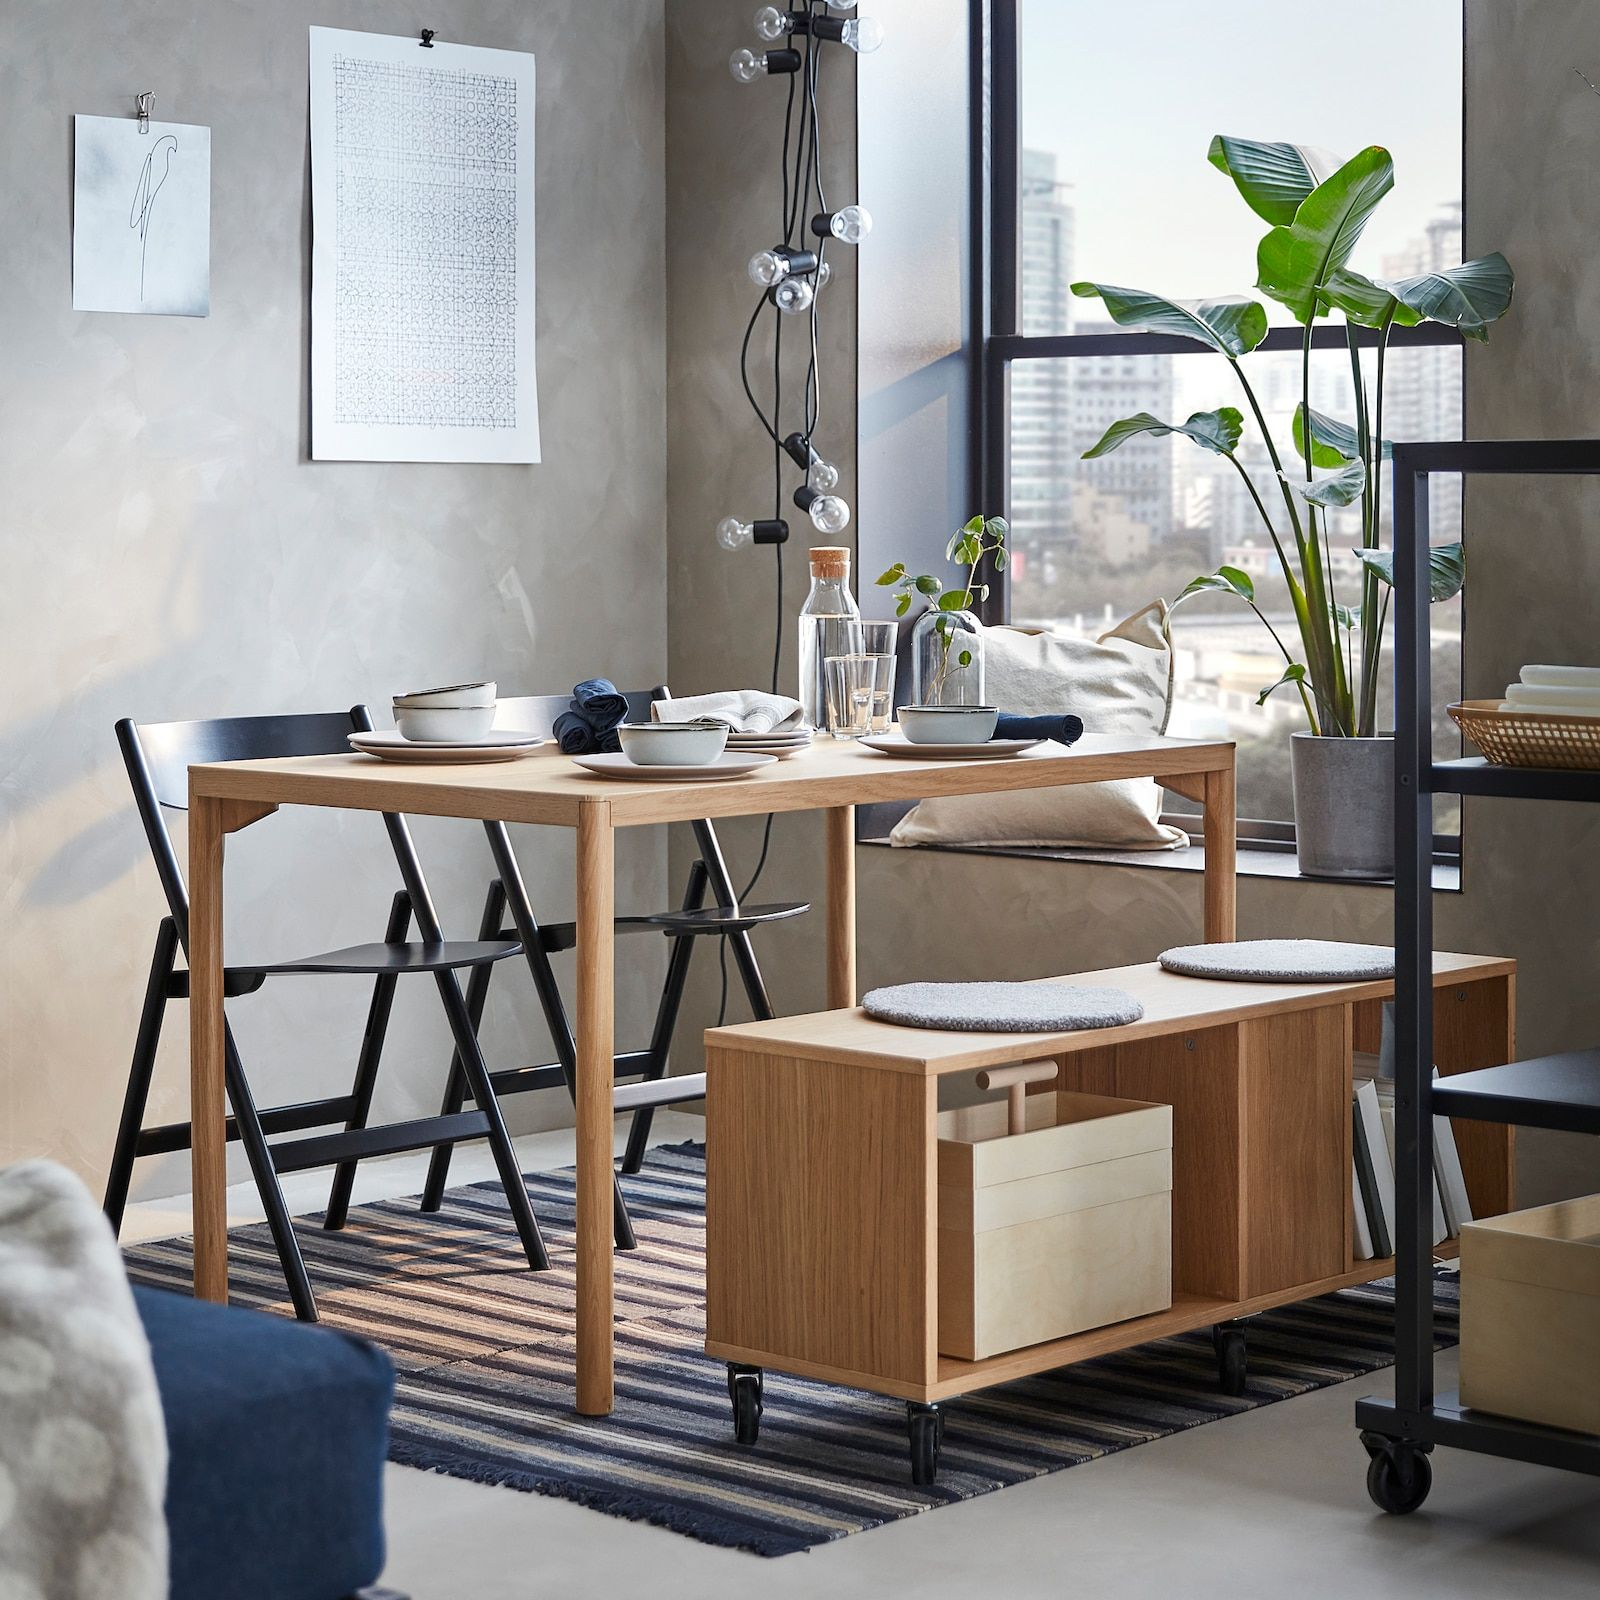 Ravaror Dining Table Oak Veneer 511 8x303 4 Ikea In 2021 Ikea Small Dining Table Oak Dining Table Ikea [ 1600 x 1600 Pixel ]